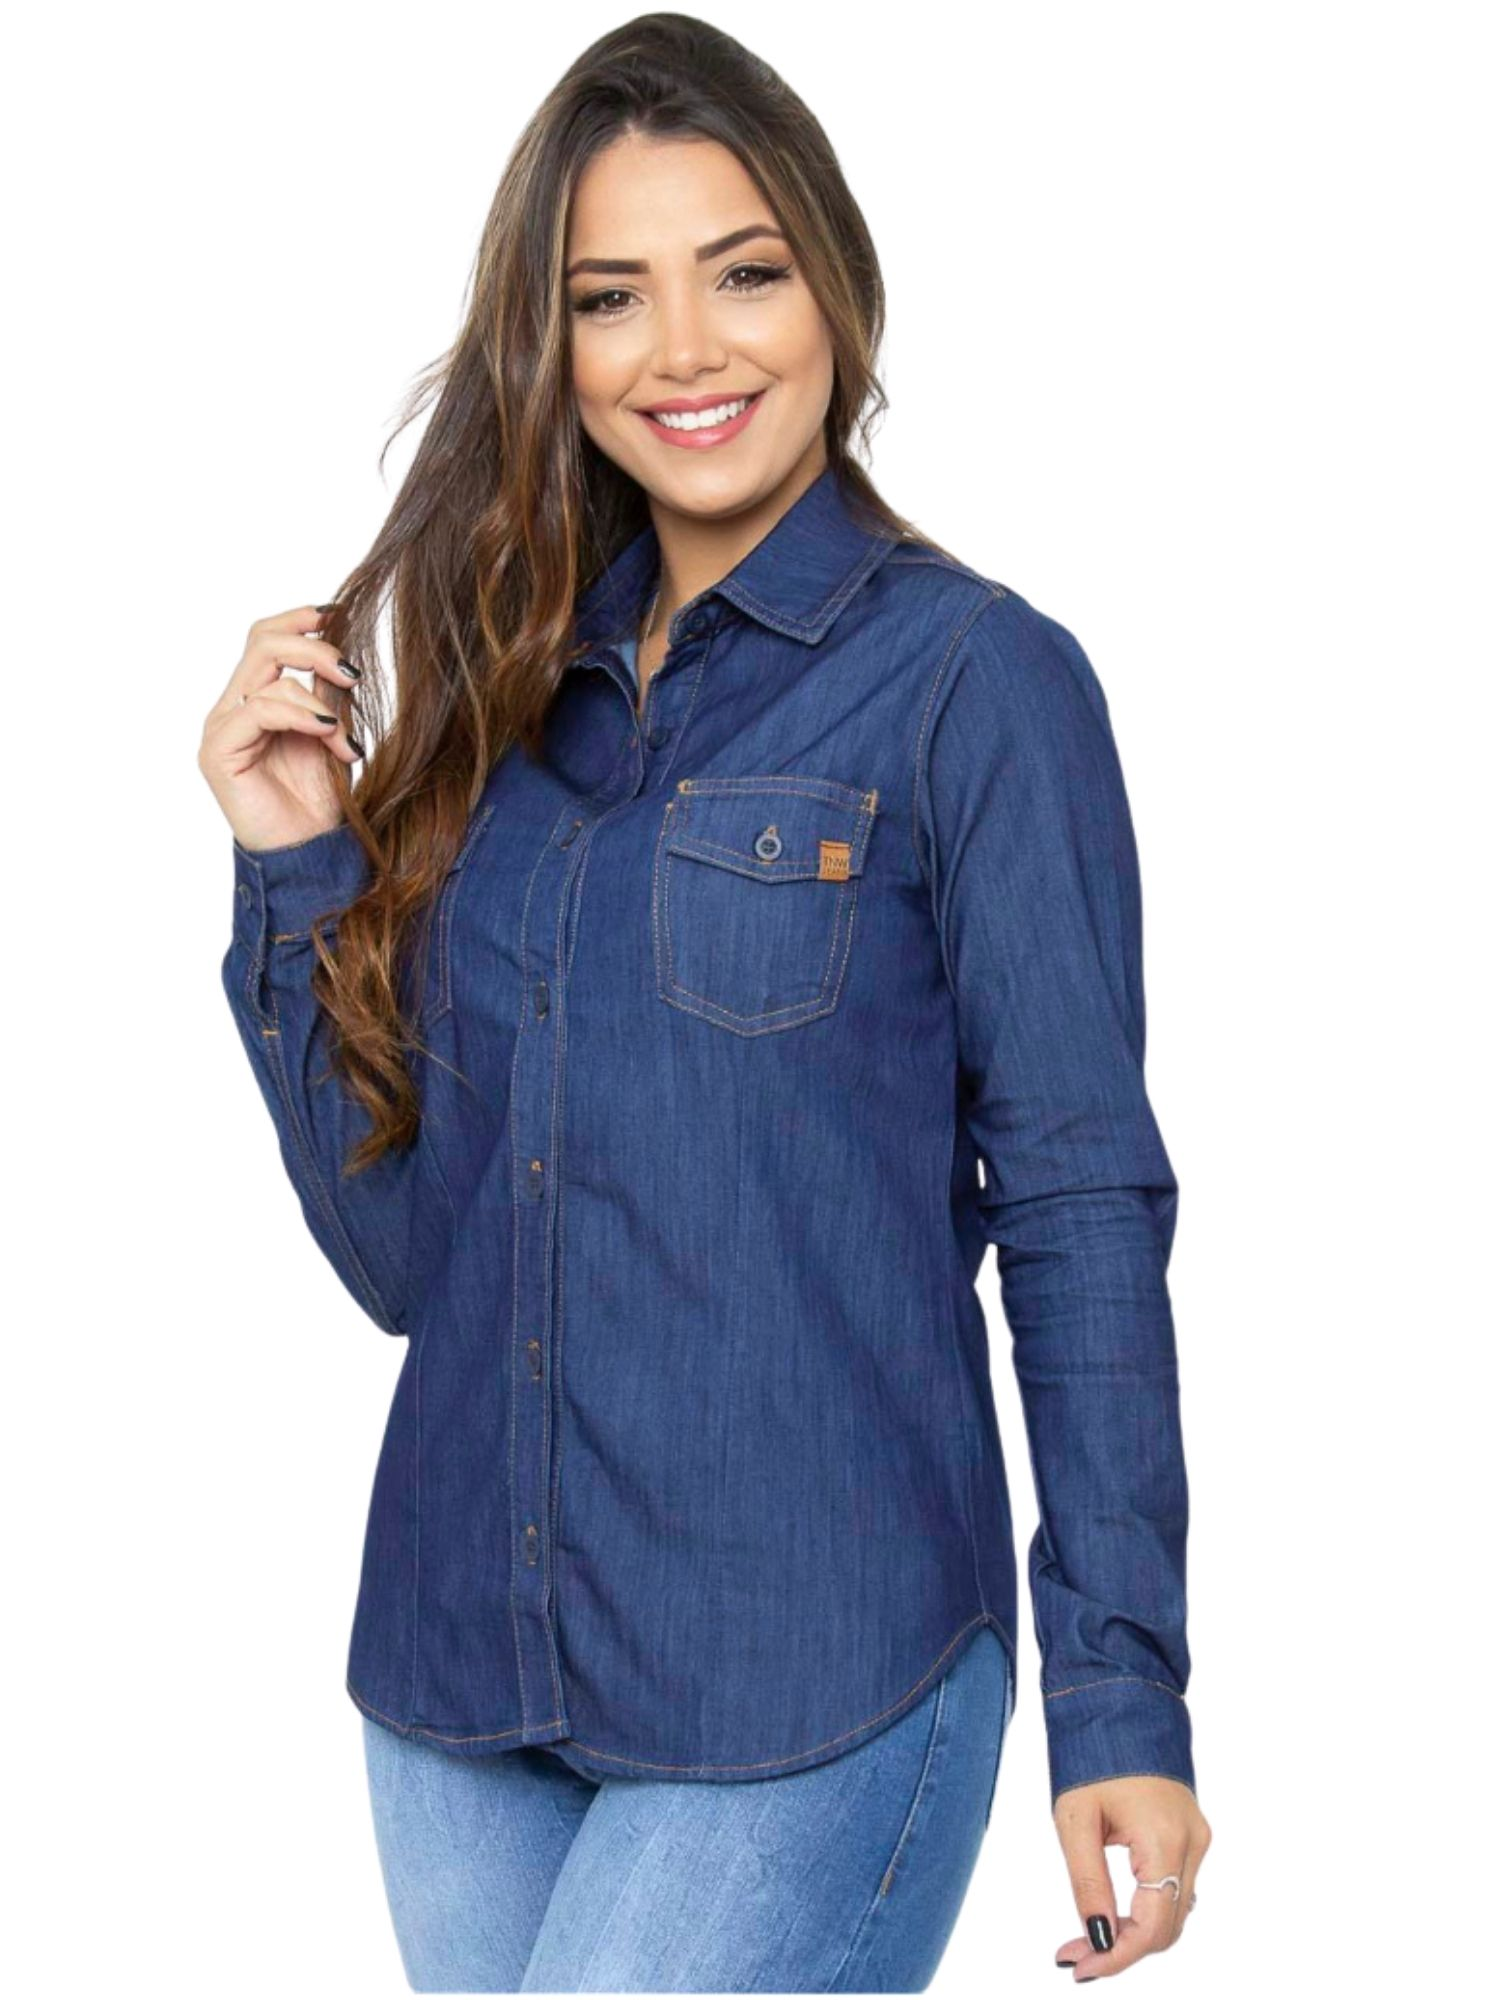 Blusa Camisa Jeans Tnw Jeans 51968